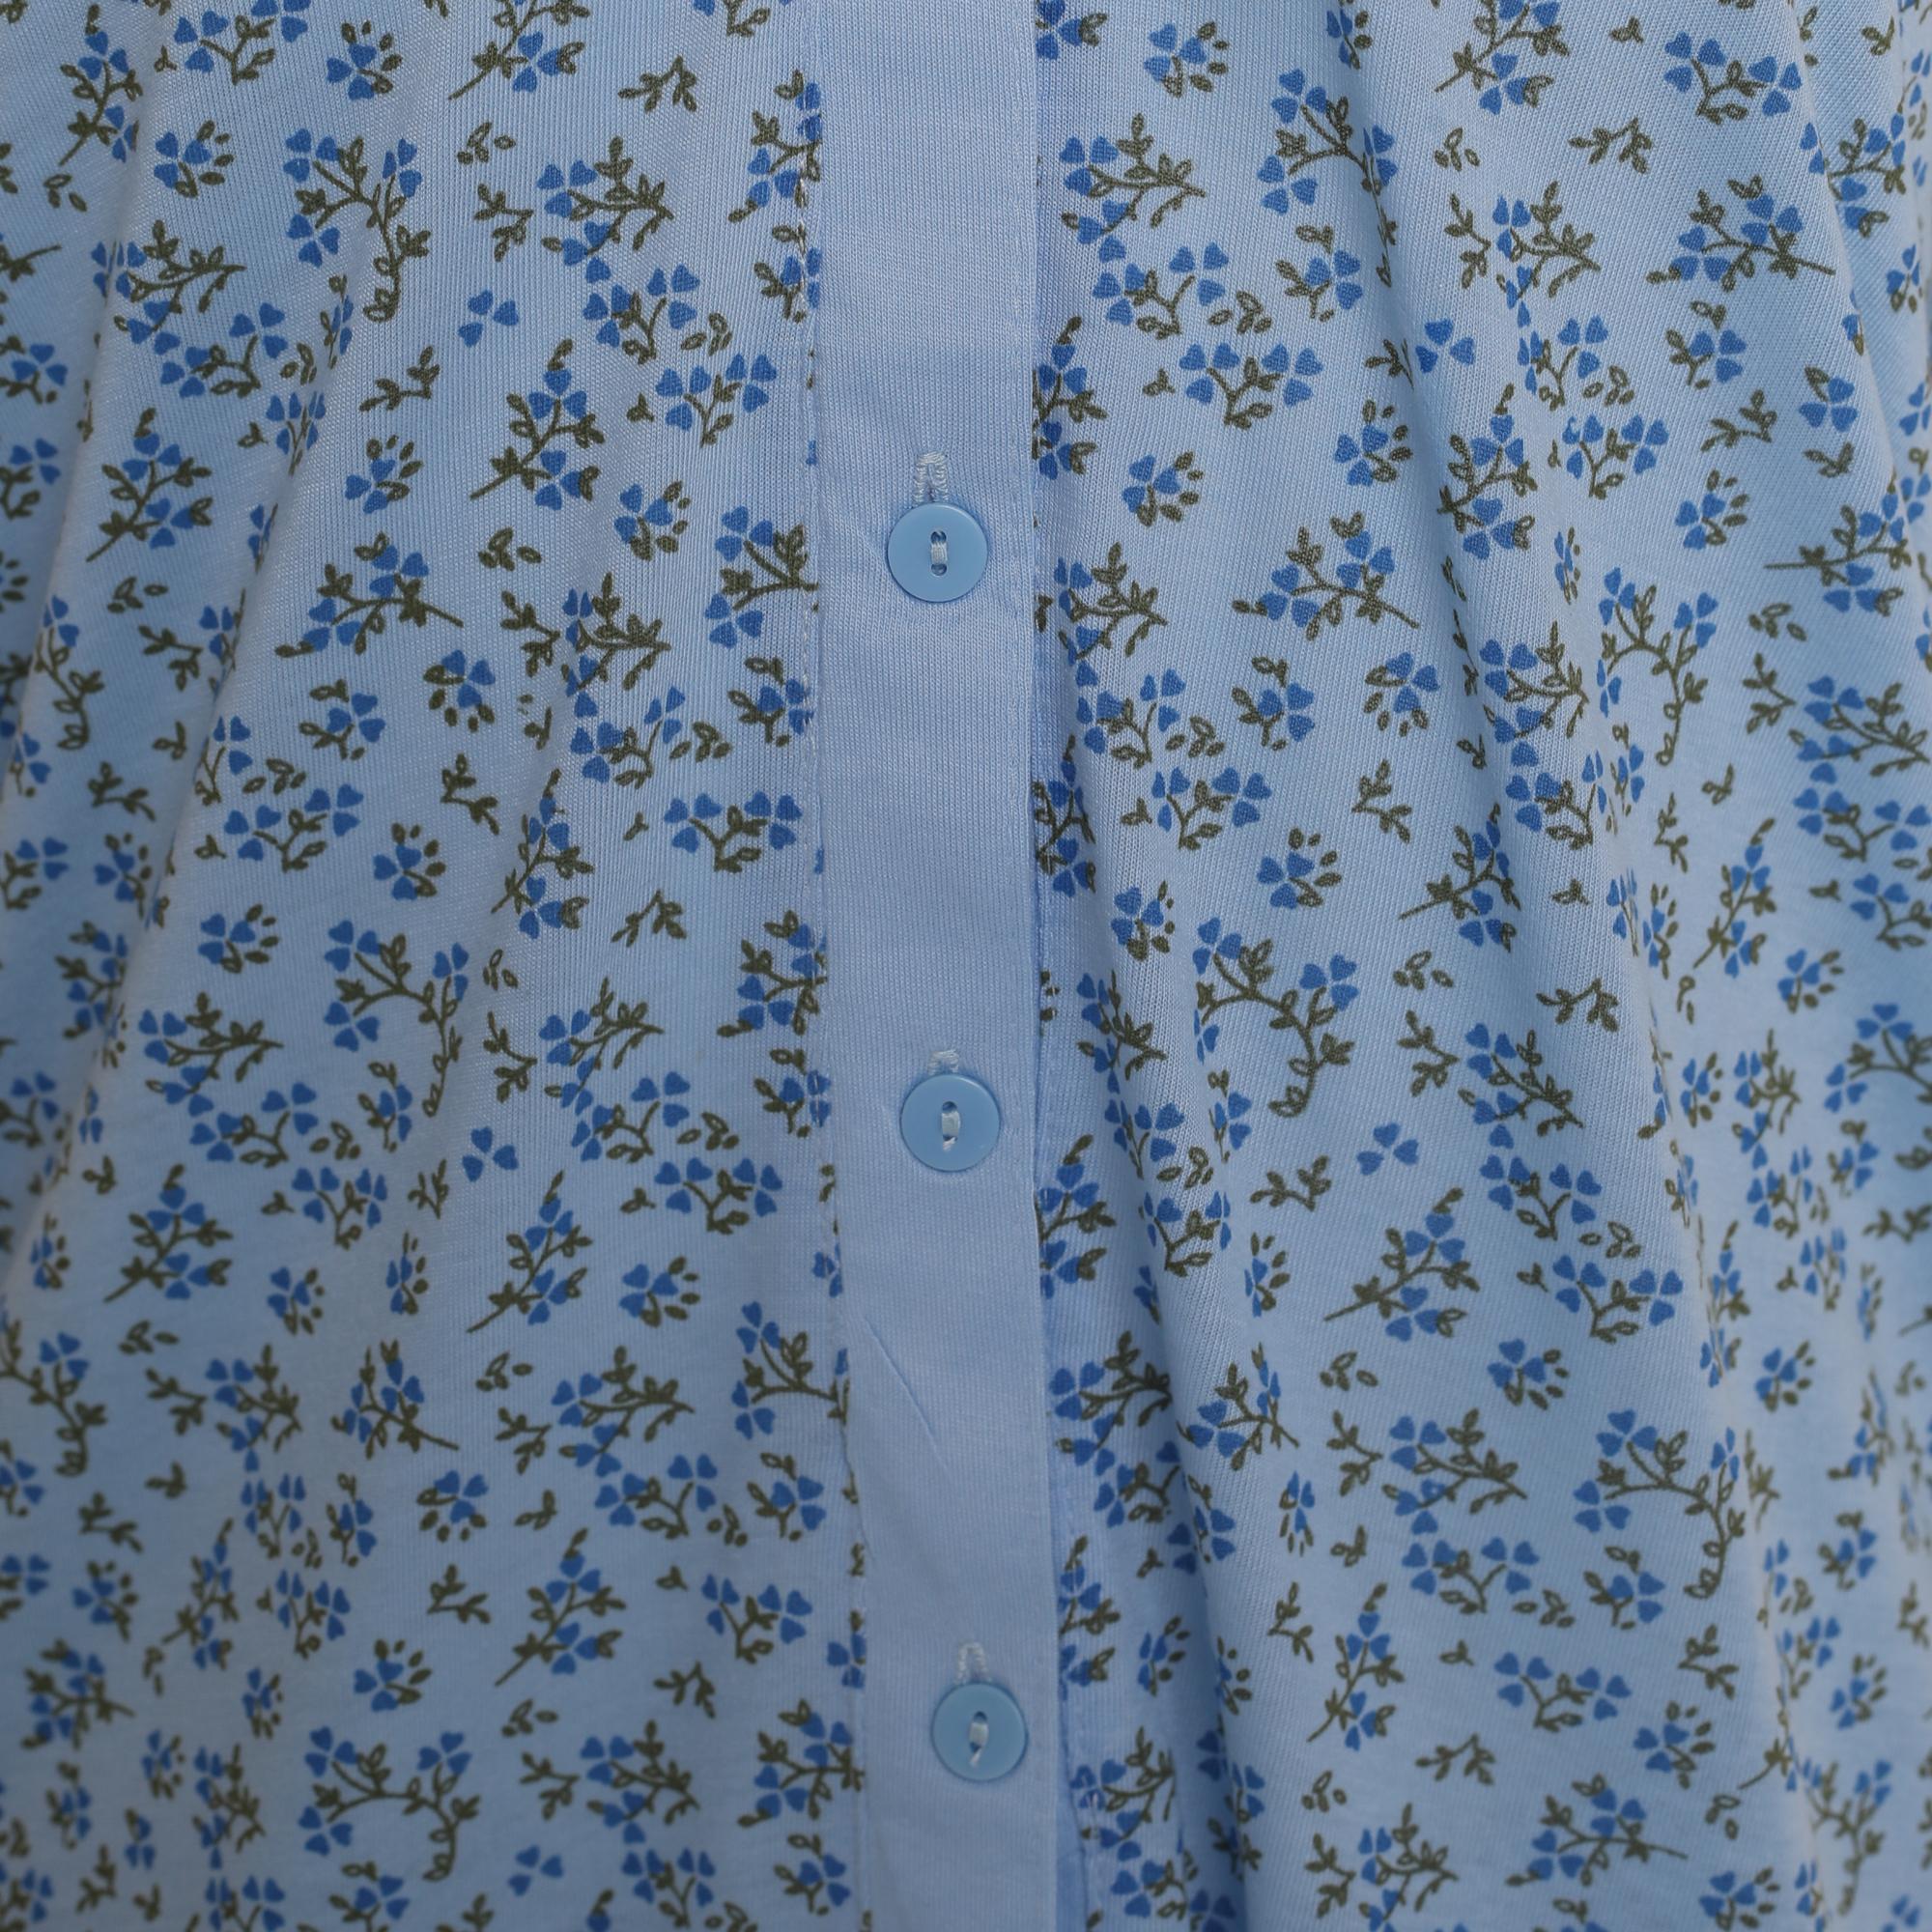 i-Smalls Ladies Pyjama Set Short Sleeve Floral Printed Buttoned Top Soft